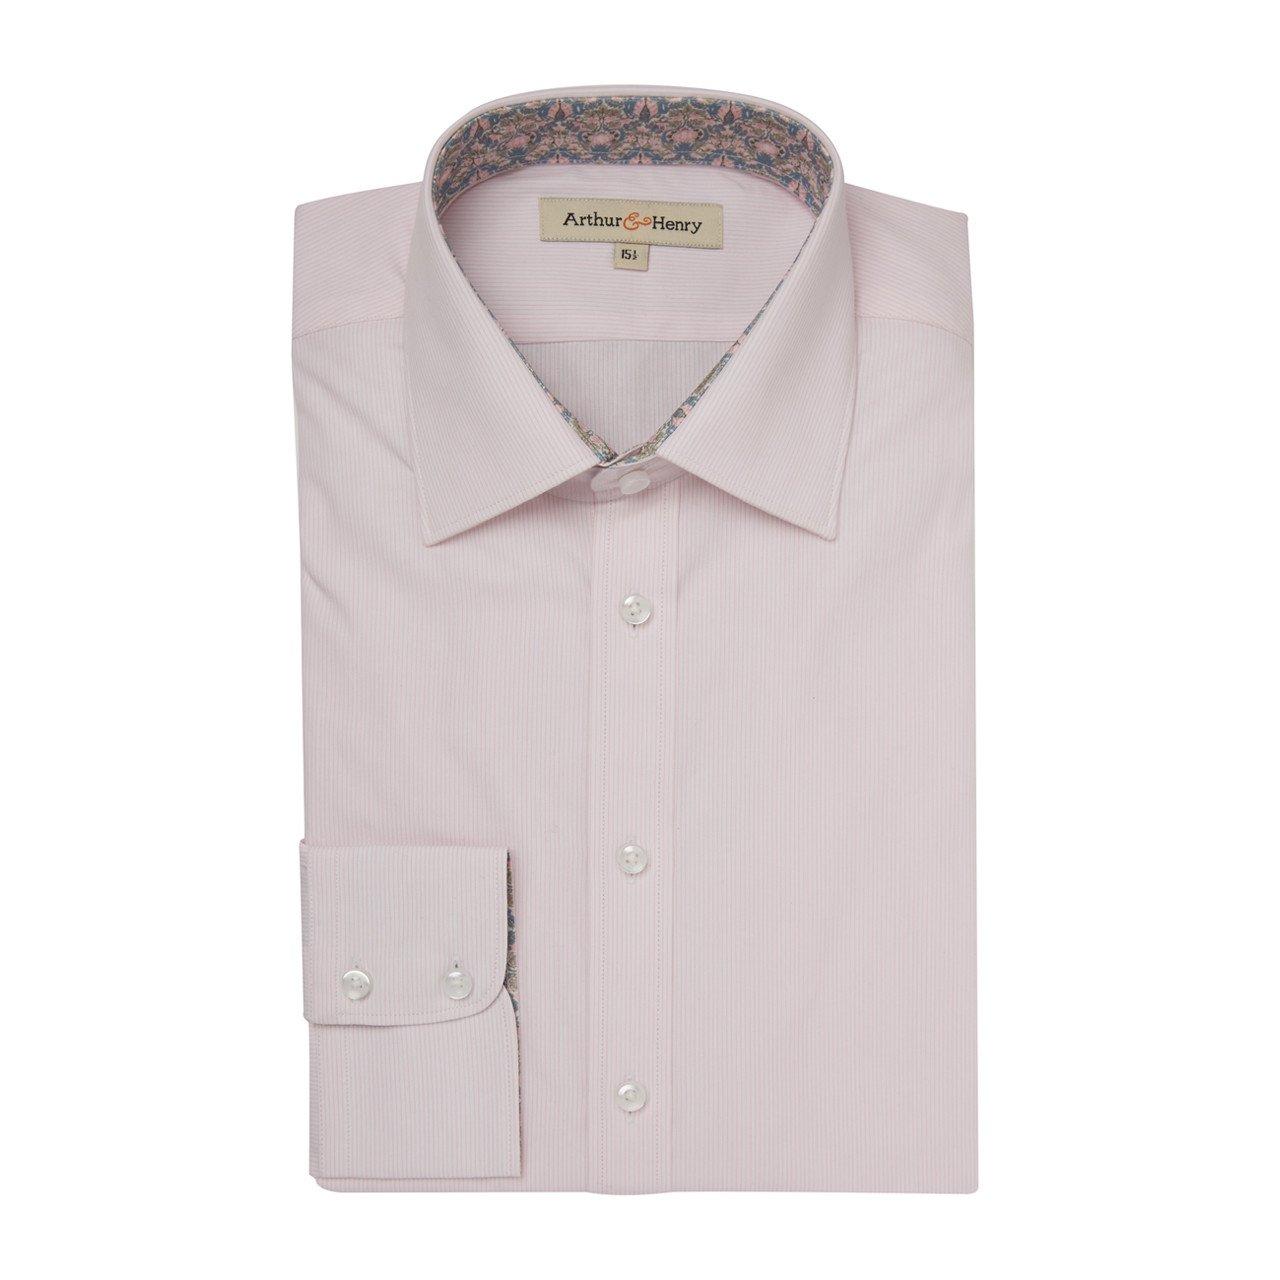 Arthur & Henry - Pink Stripe Organic Cotton Shirt.